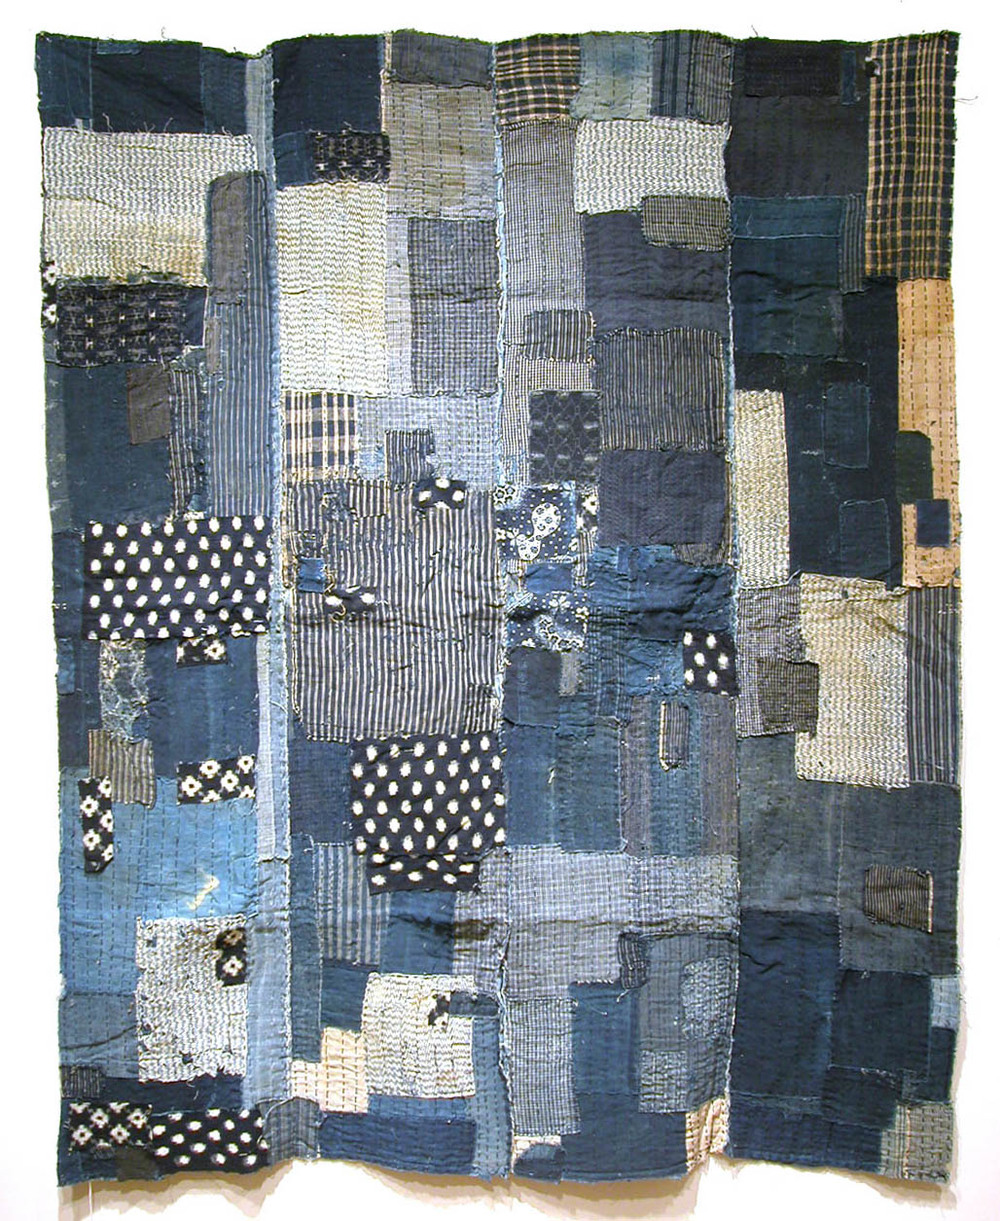 Japanese Textiles    Boro, Futon Cover Lining, Futonji  , Pre-WWII Sashiko stitching/patchwork 62.5 x 50.5 in / 158.8 x 128.3 cm / JTex 32